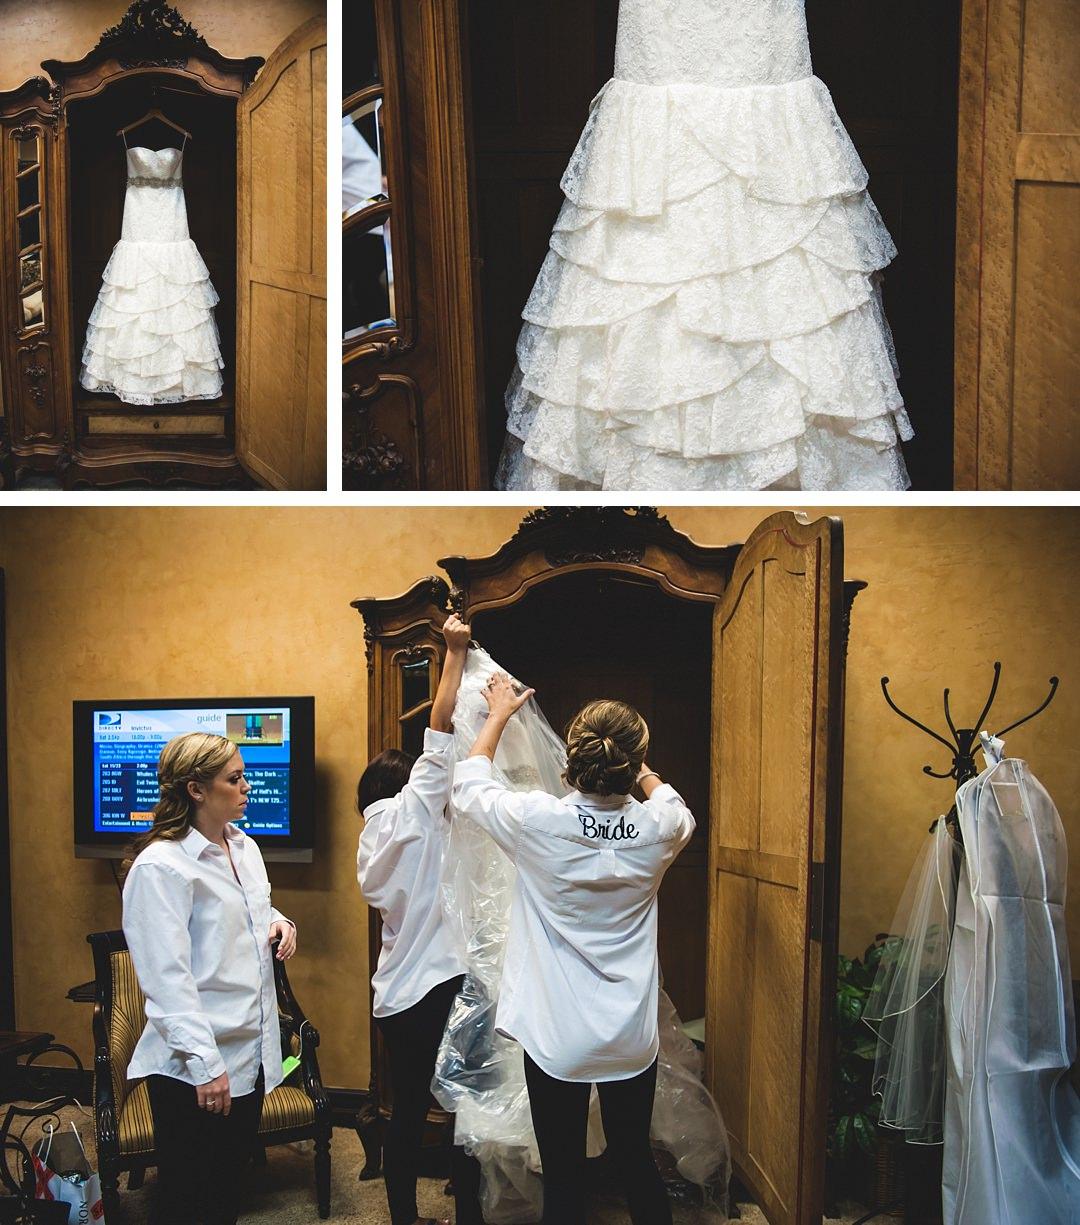 Scott-english-photo-arizona-wedding-photographer_0006.jpg